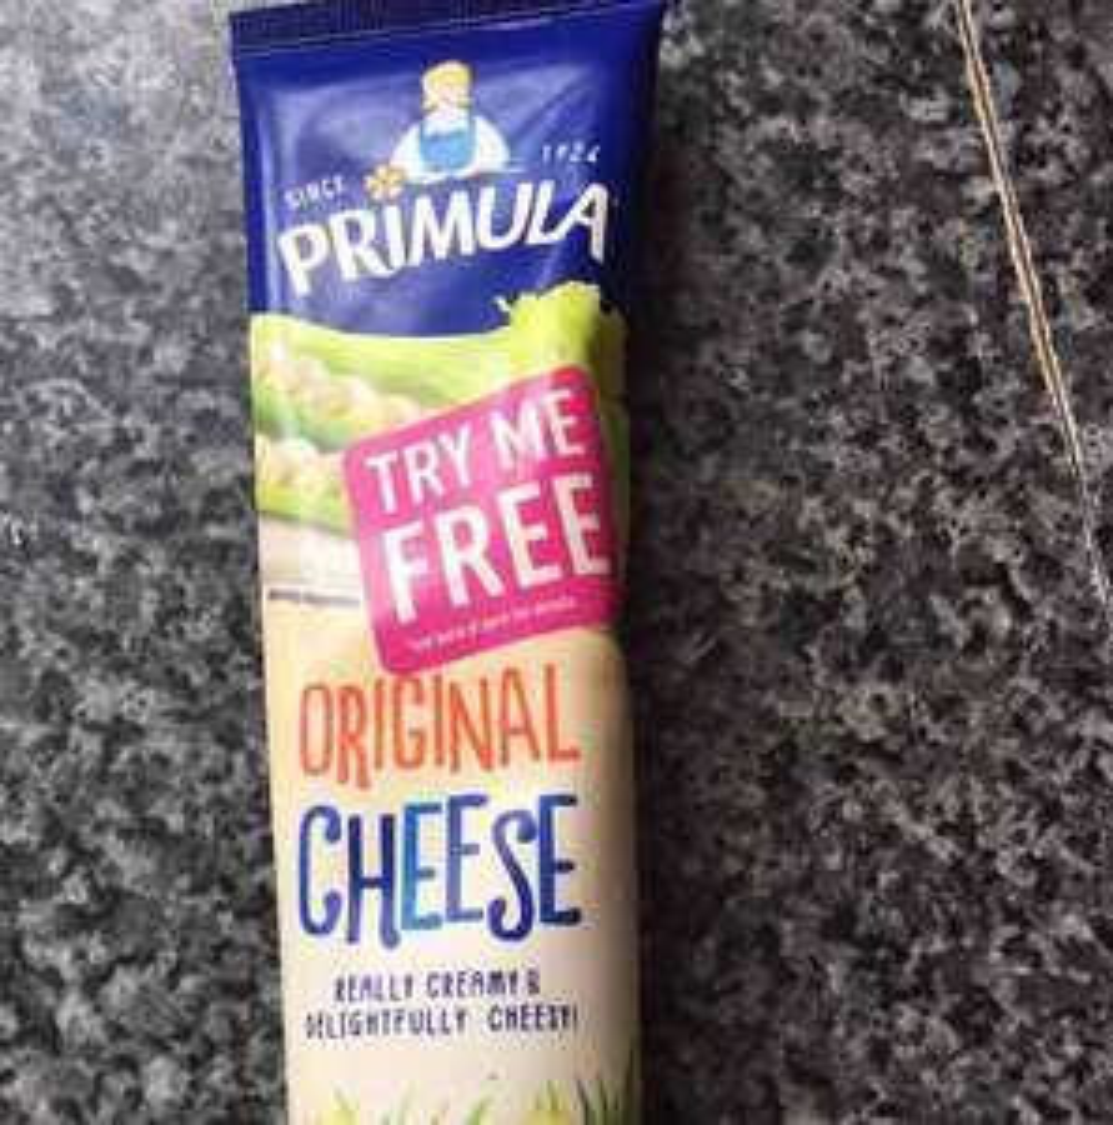 FREE tube of Primula Cheese via claim back (Primula Try Me Free) - £1.44